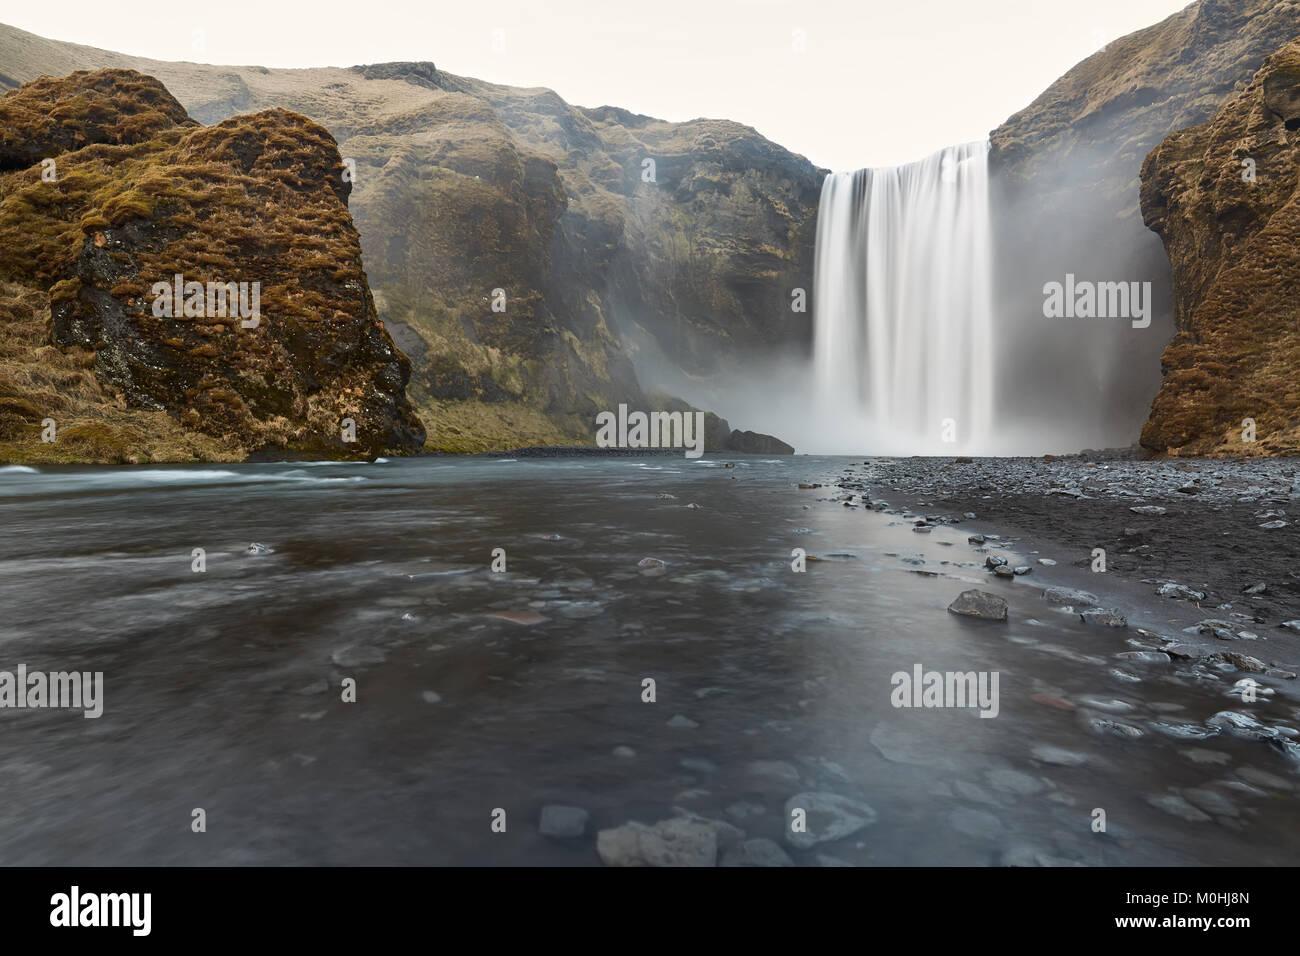 Icelandic landscape of waterfall - Stock Image